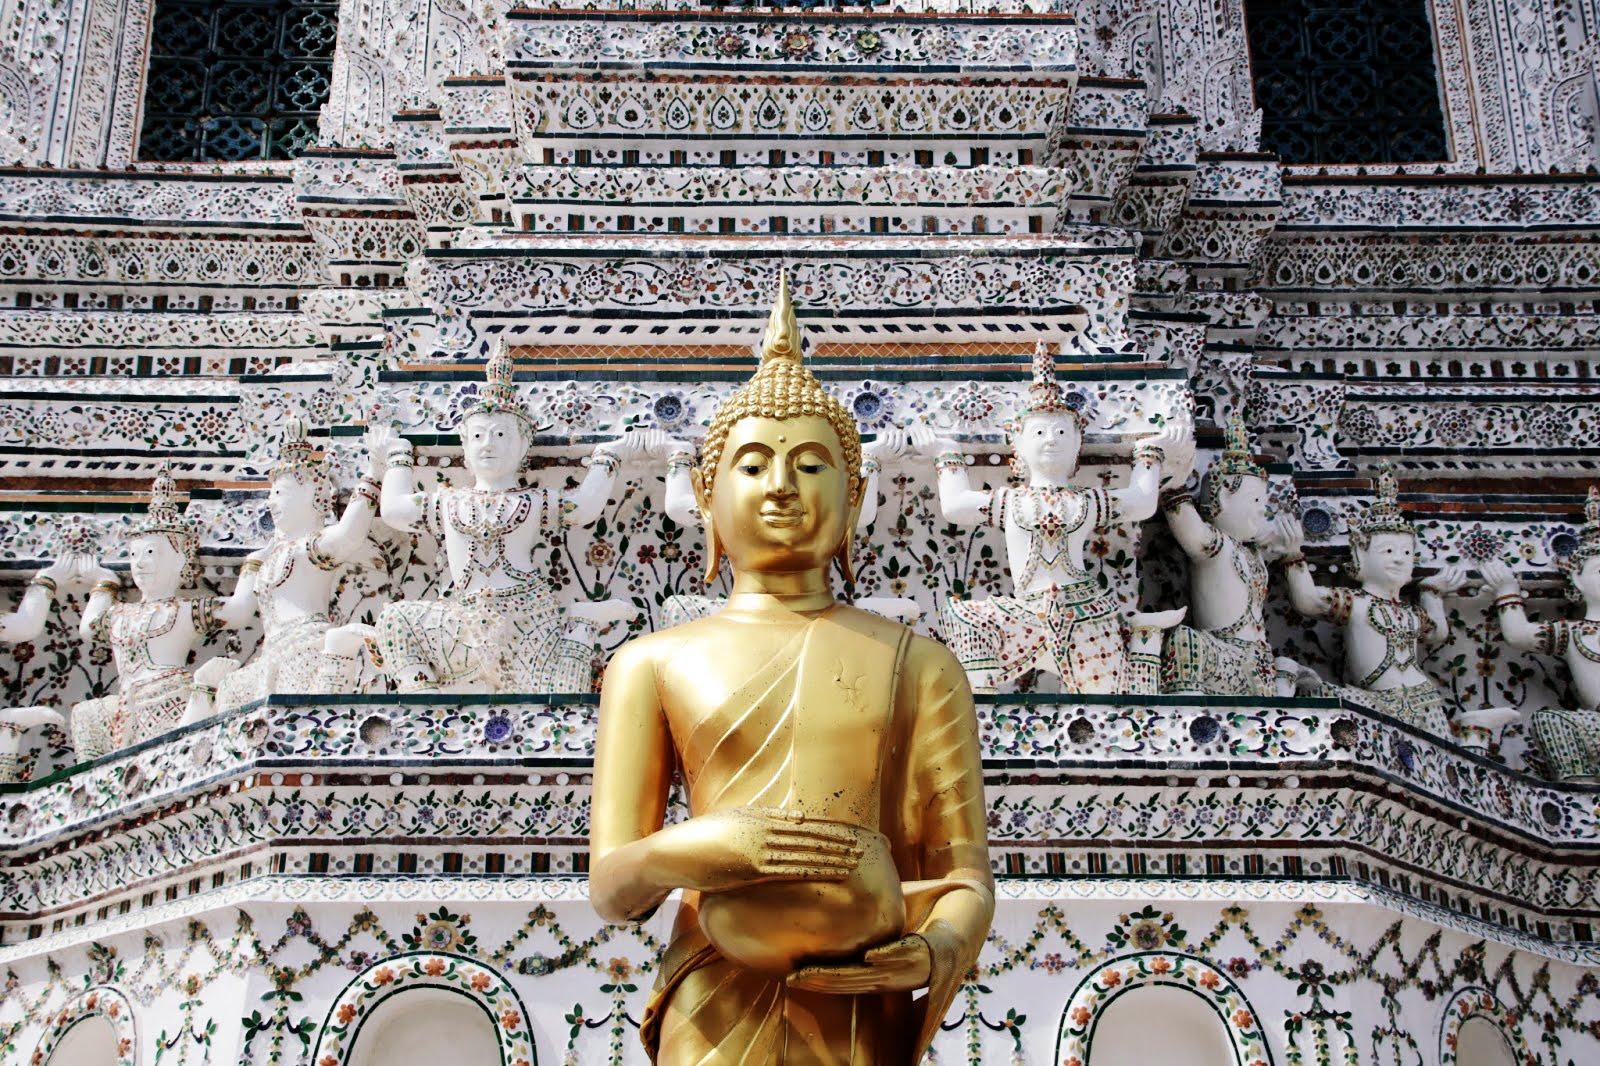 voyage thailande koh tao samui pha ngan plongée tortures blog avis itineraires choses  à visiter